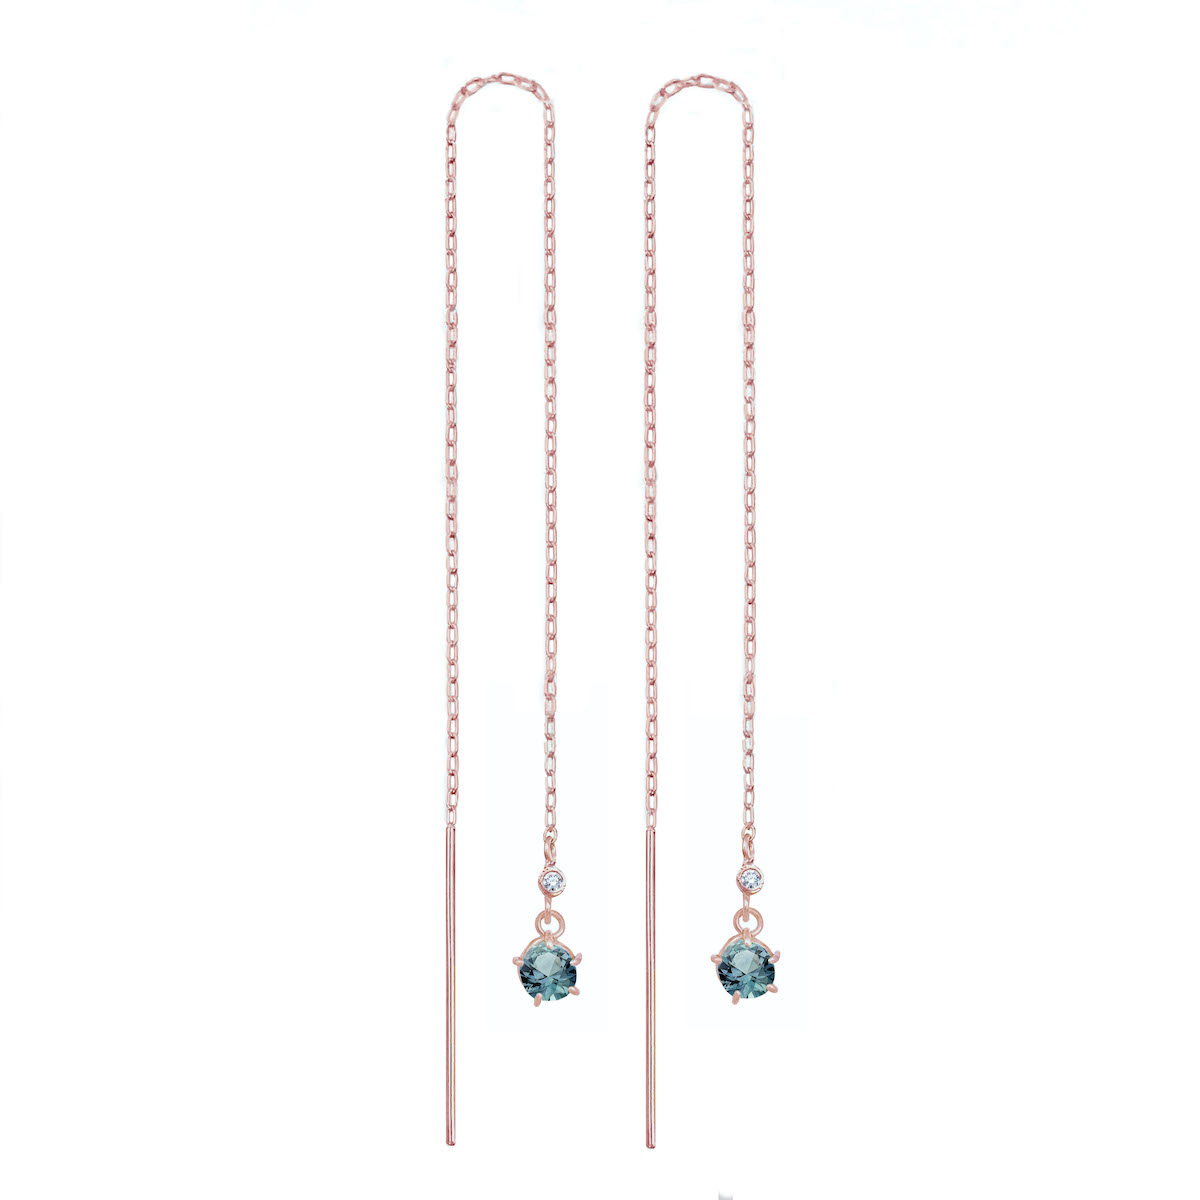 Teal-Sapphire-Drop-Threader-Rose-Gold-32-3 RG copy